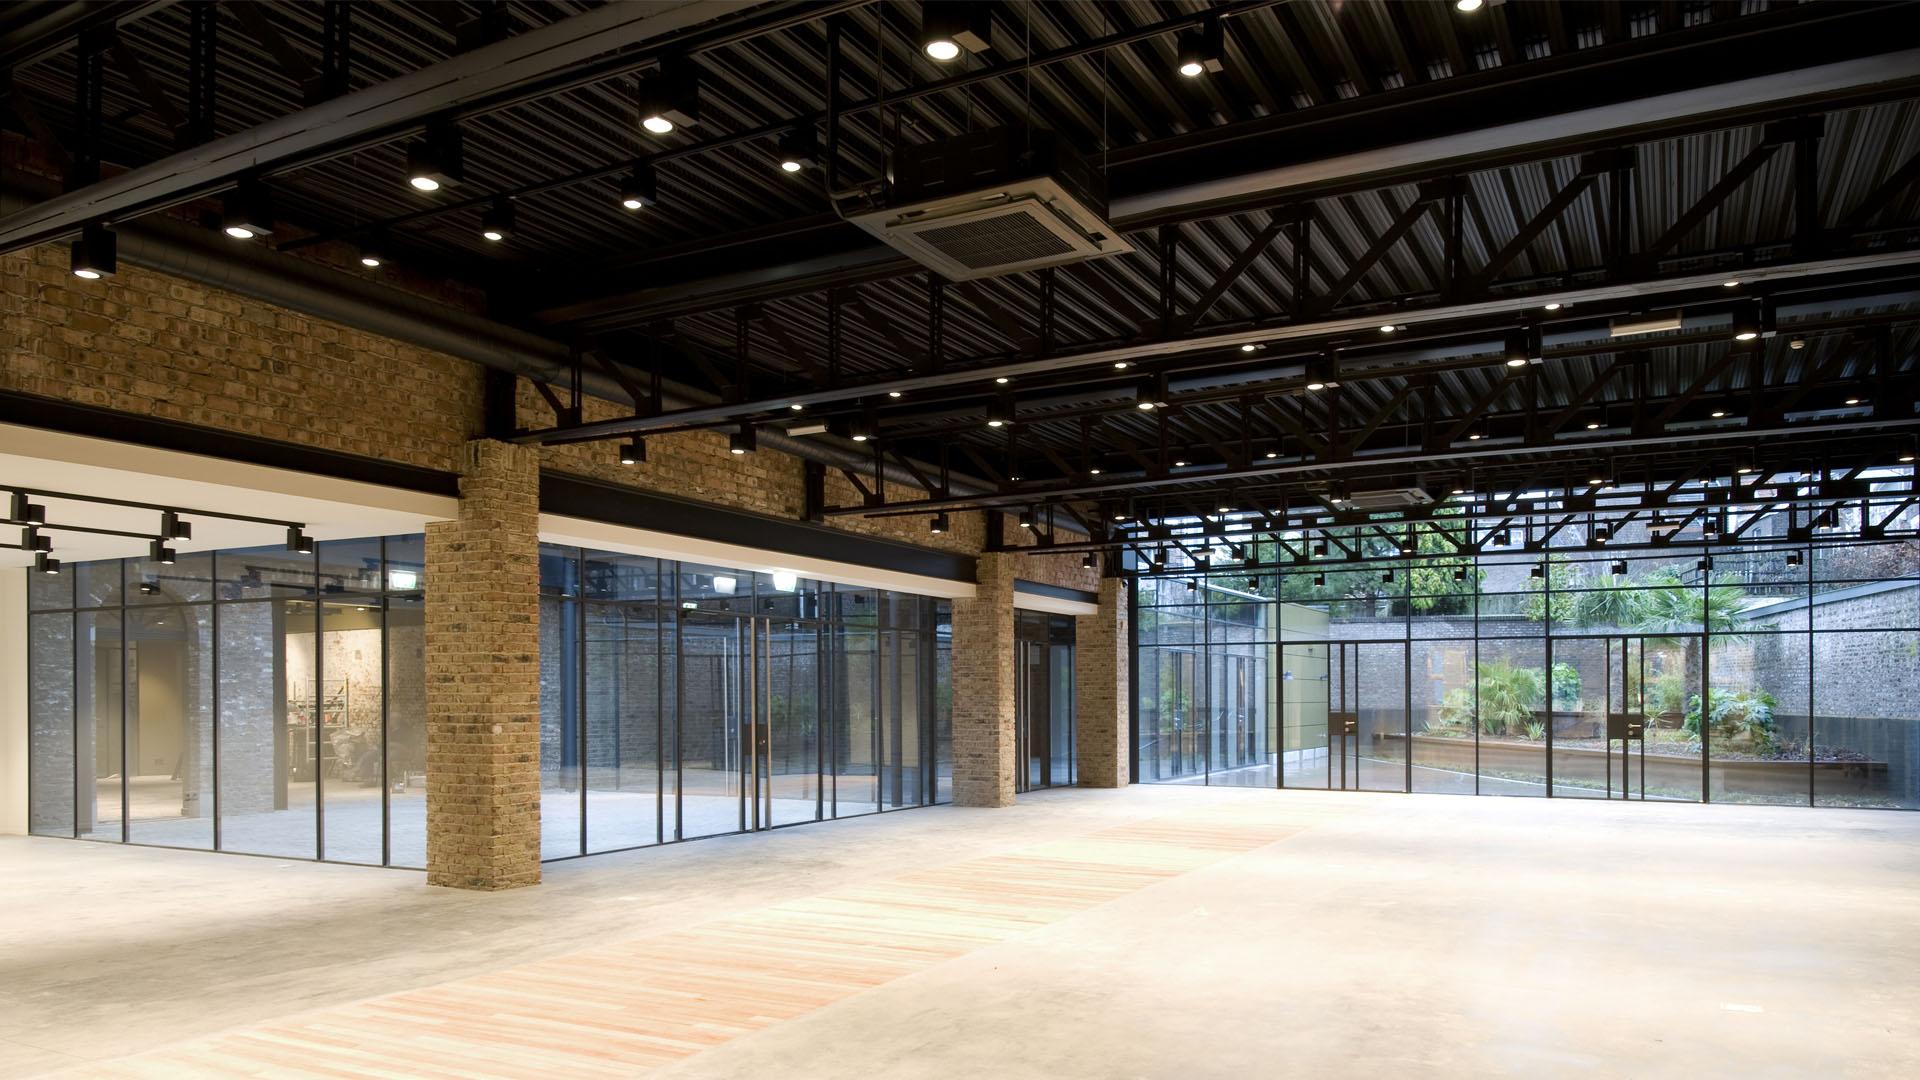 Steel glazed indoor doors and partitions at office building in Bredestraat Maatsricht, the Netherlands